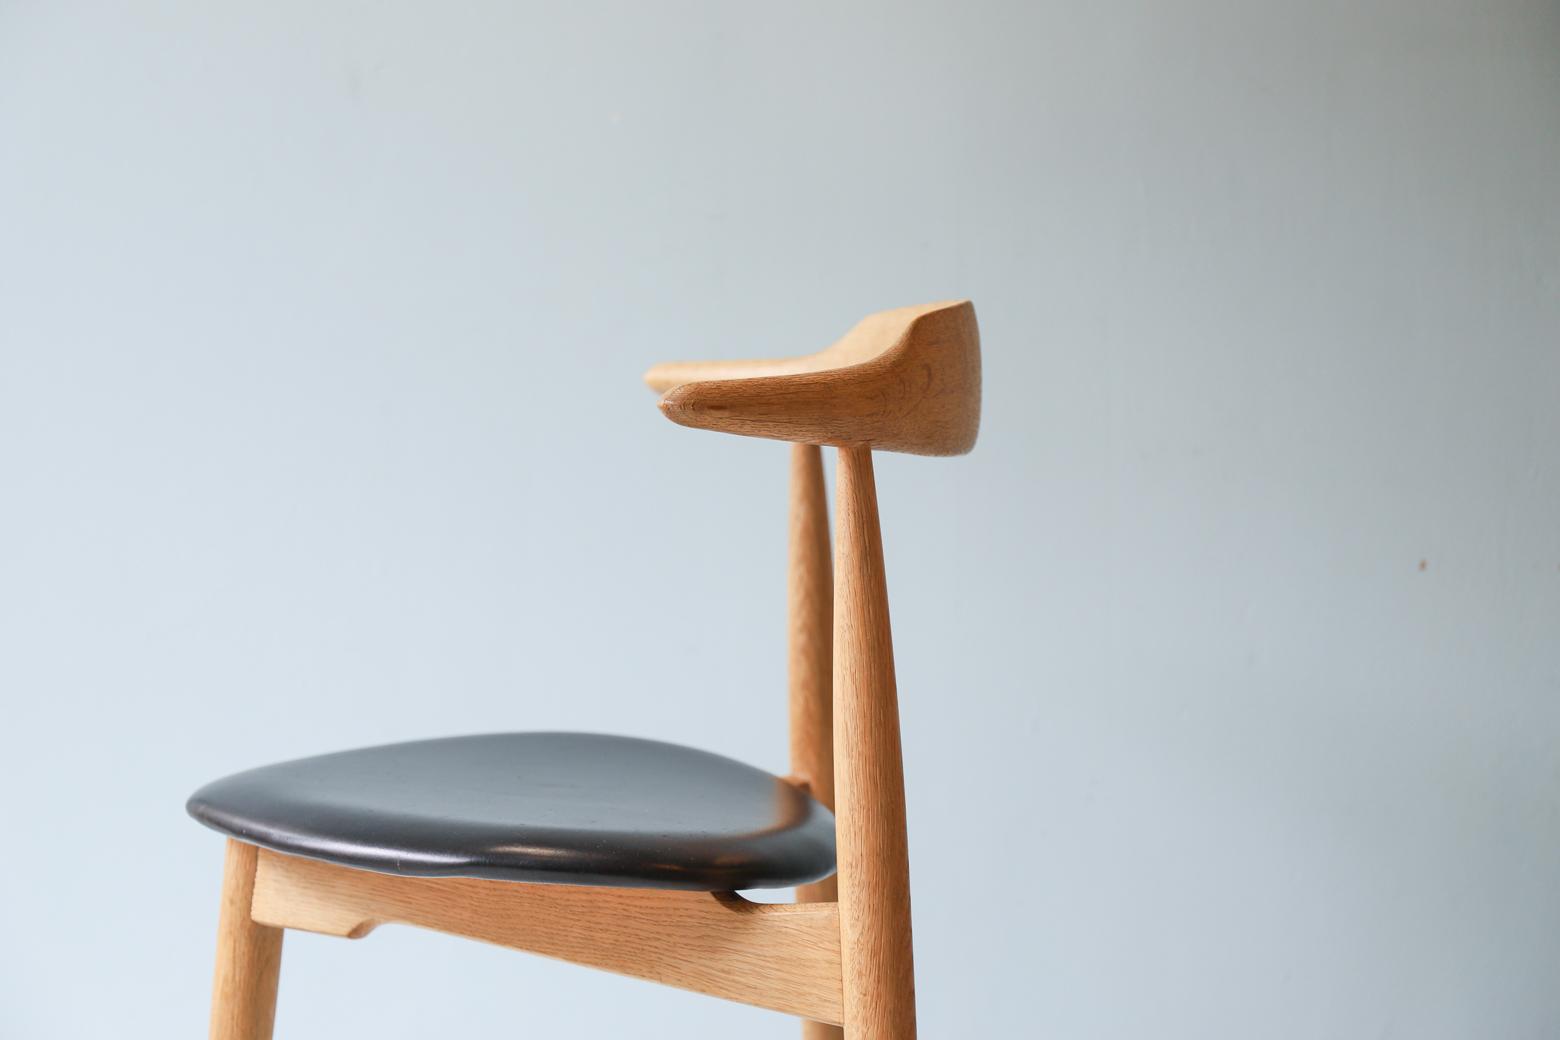 Fritz Hansen Heart Chair FH-4104 Hans J. Wegner/フリッツ・ハンセン ハートチェア ハンス・J・ウェグナー デンマーク ヴィンテージ 北欧家具